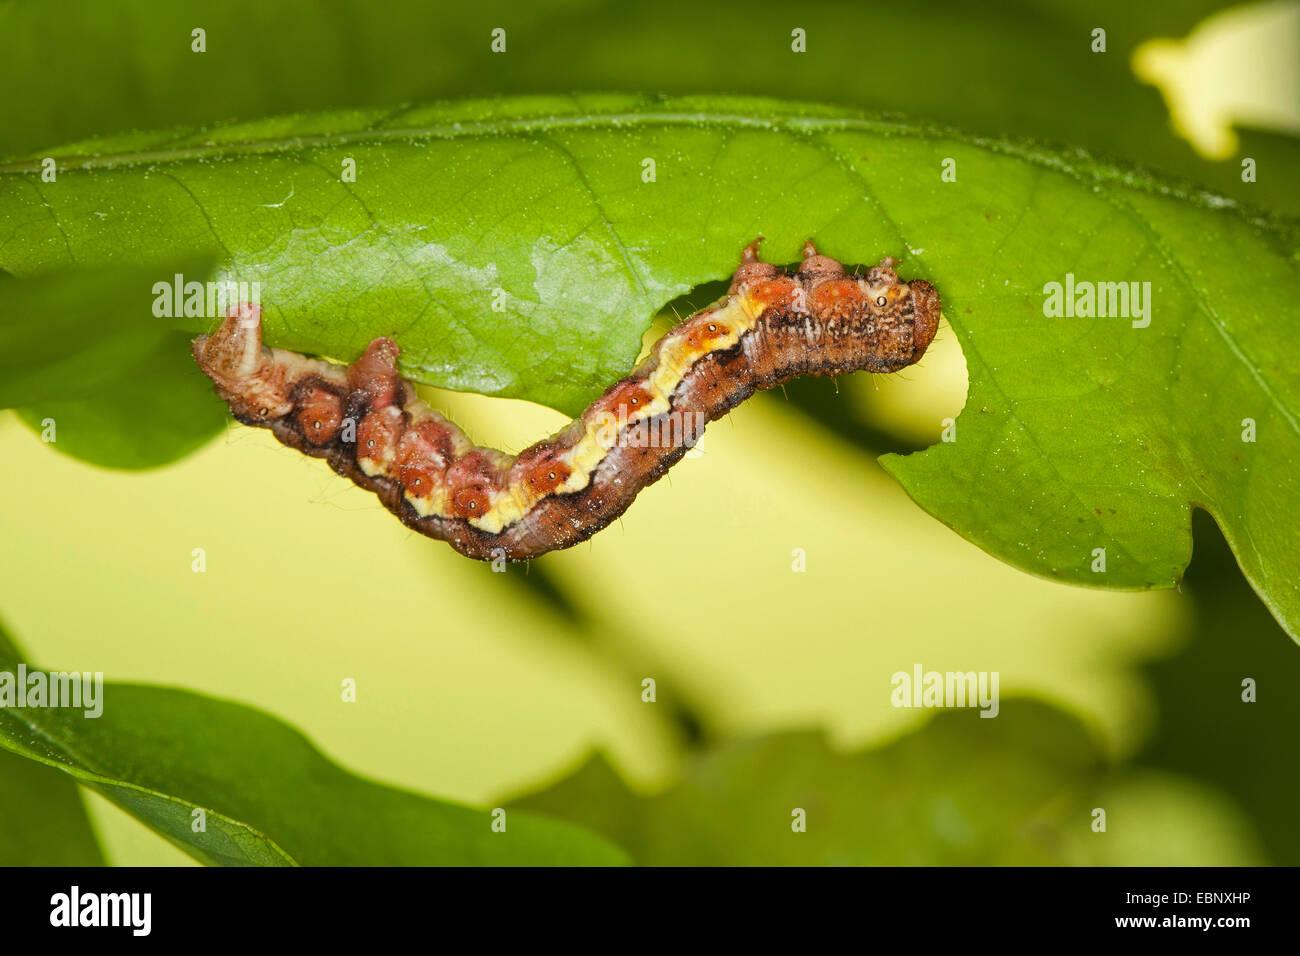 Mottled umber (Erannis defoliaria, Phalaena defoliaria, Hybernia defoliaria), caterpillar feeeding on oak leaf, - Stock Image